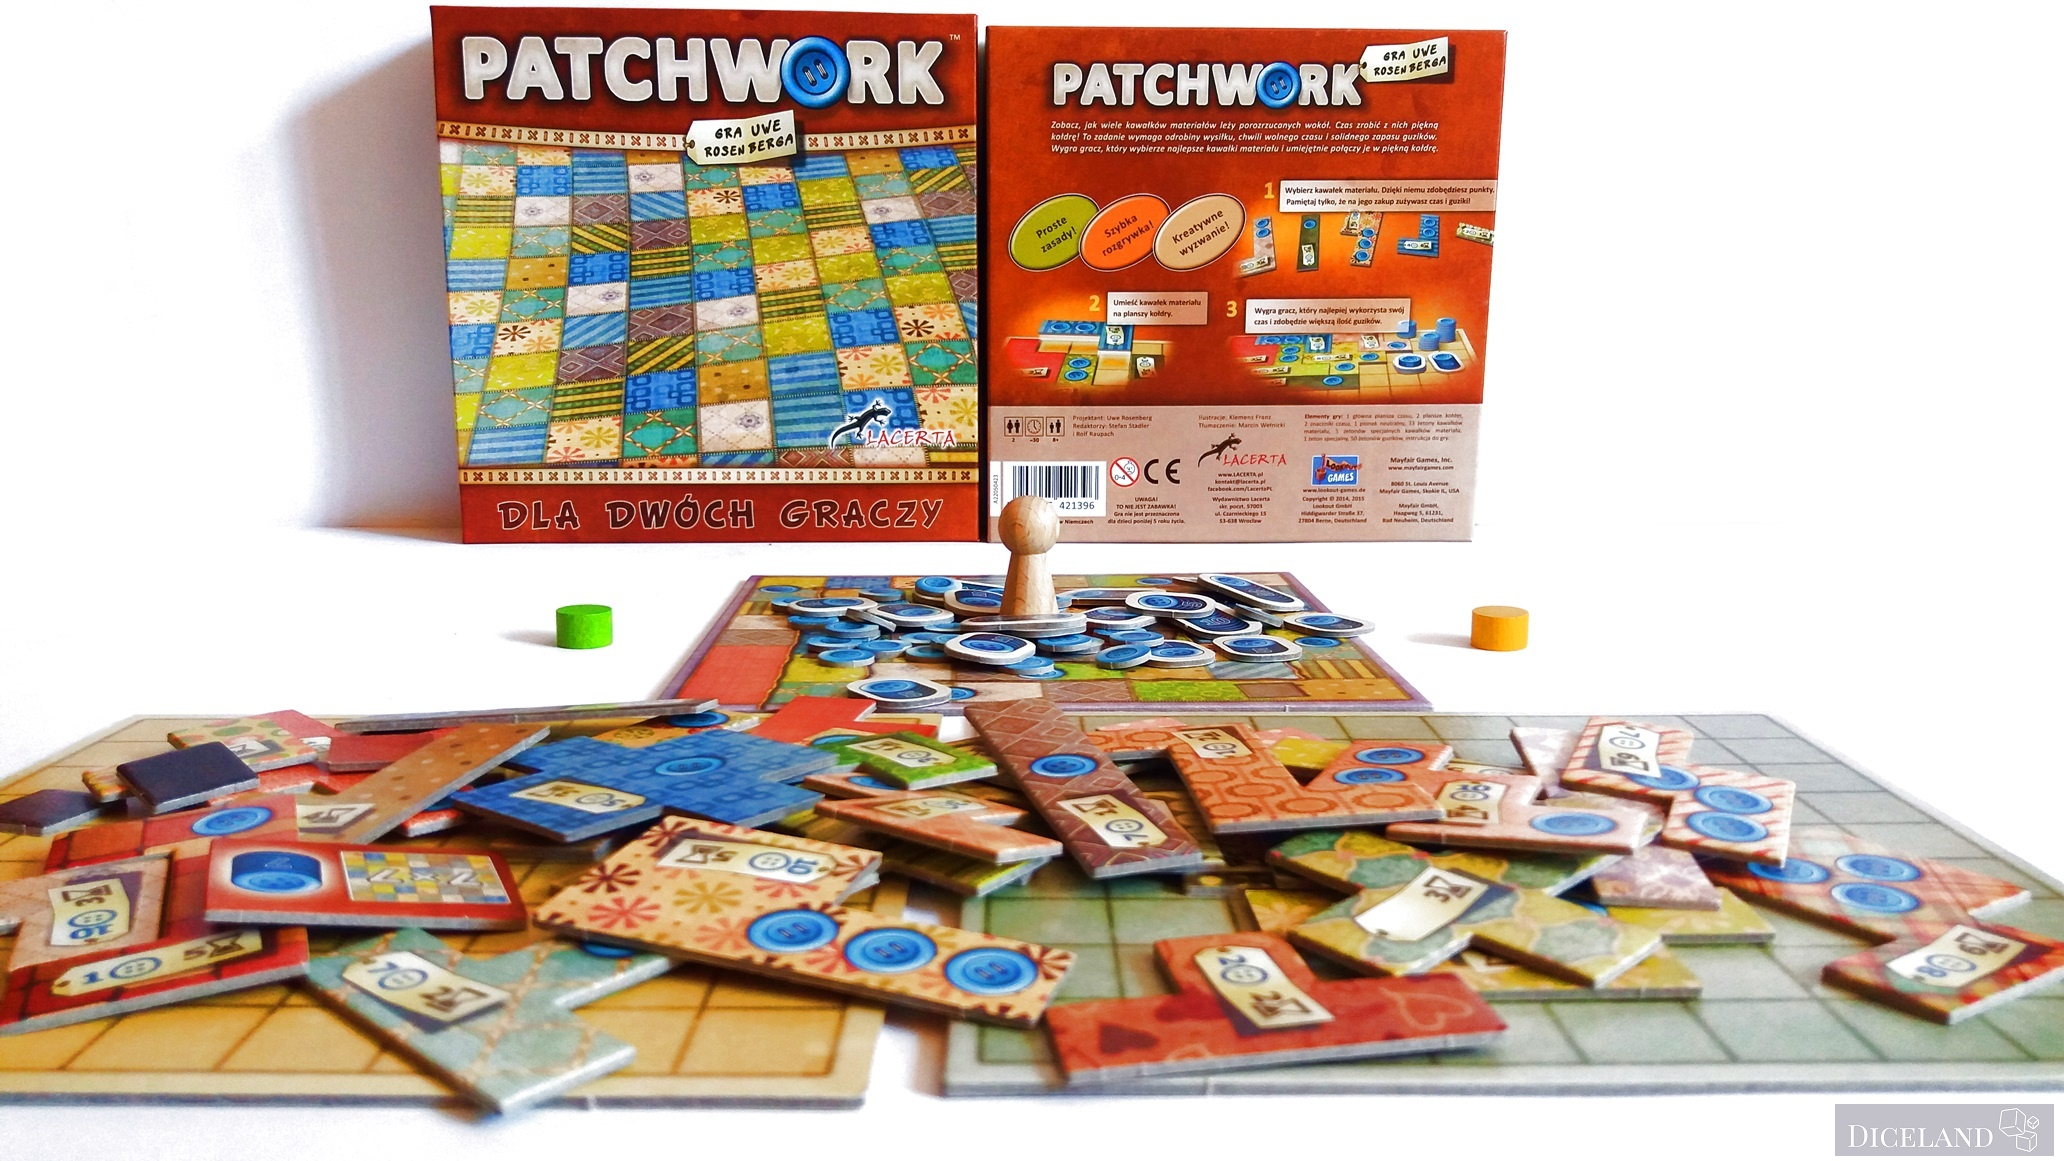 Patchwork 21 Recenzja #9 Patchwork